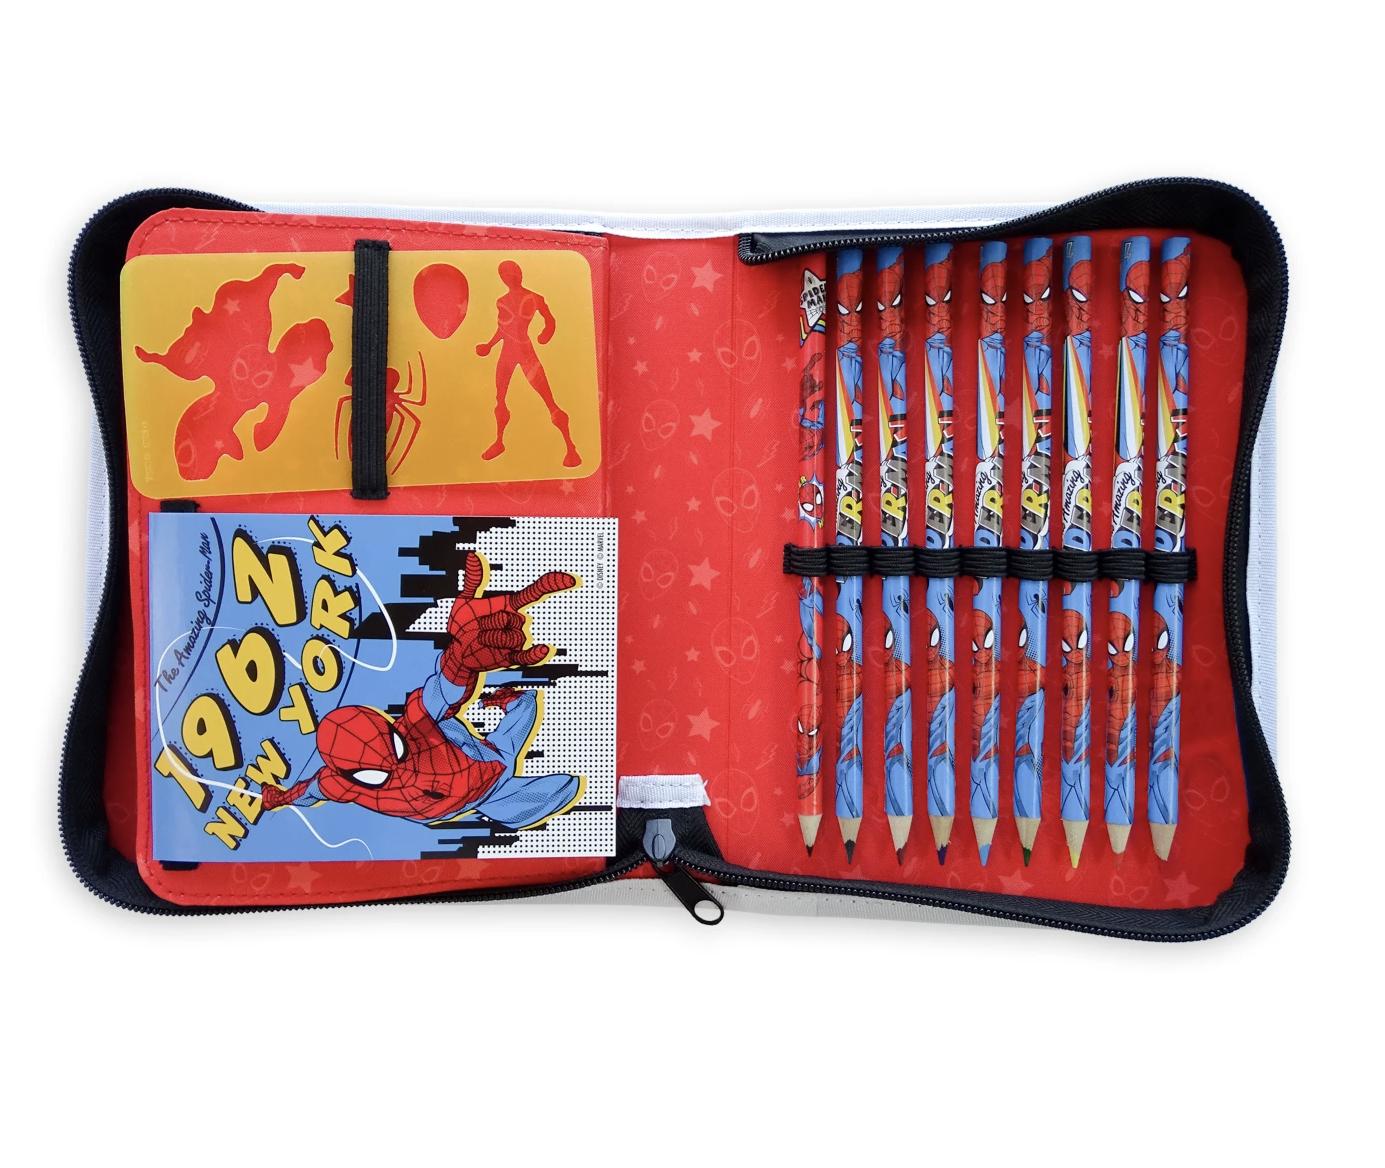 Spider-Man pencil case